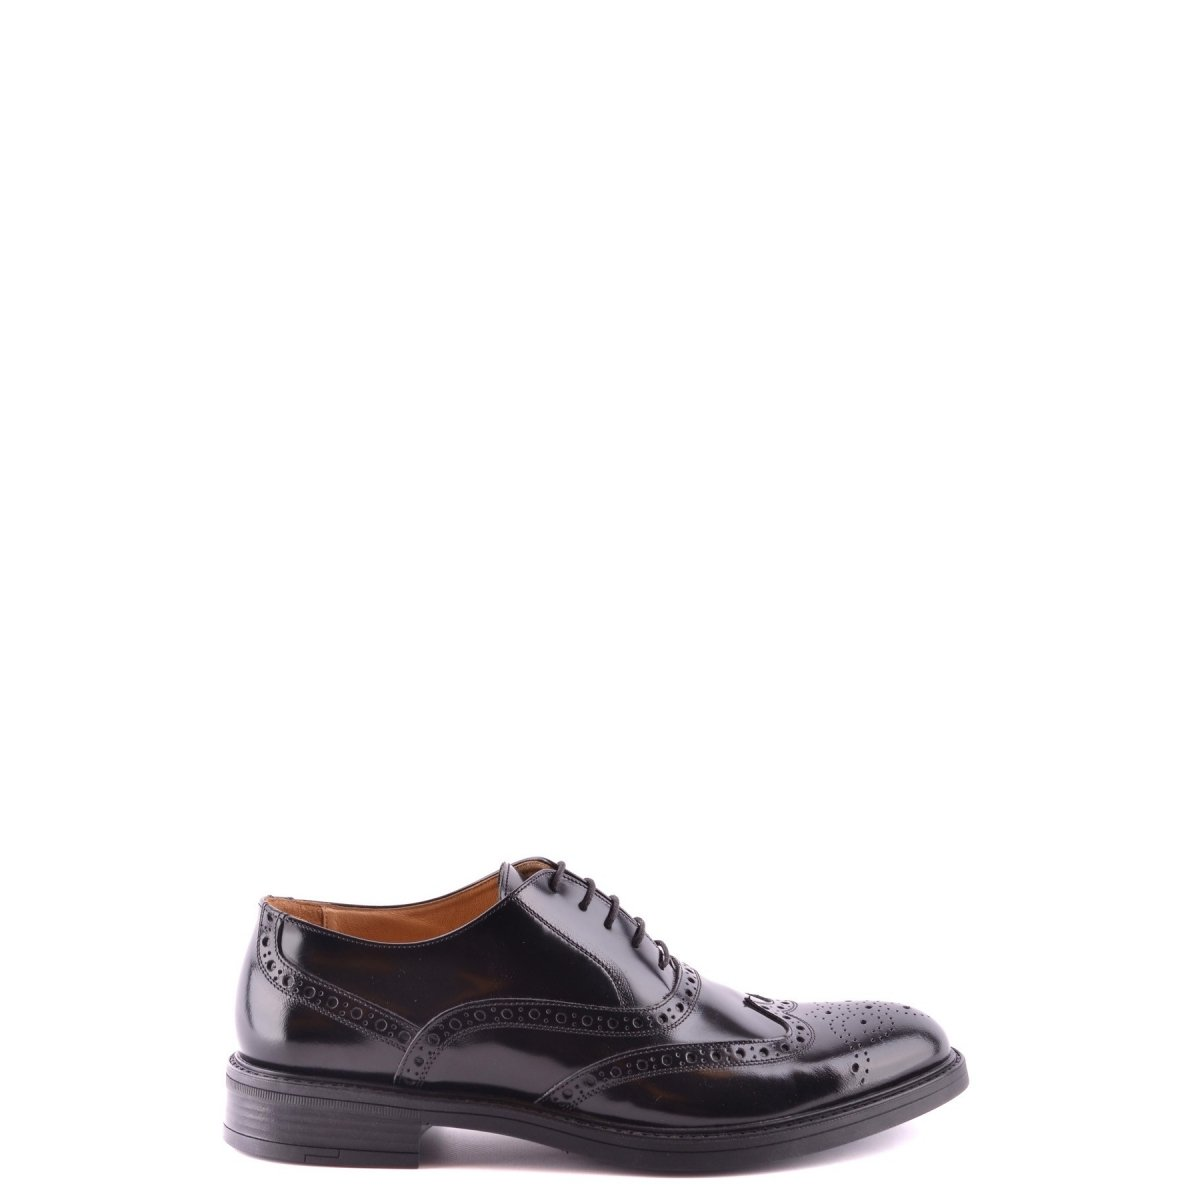 Schuhe nn283 Barbati Uomo 40 schwarz leder 40